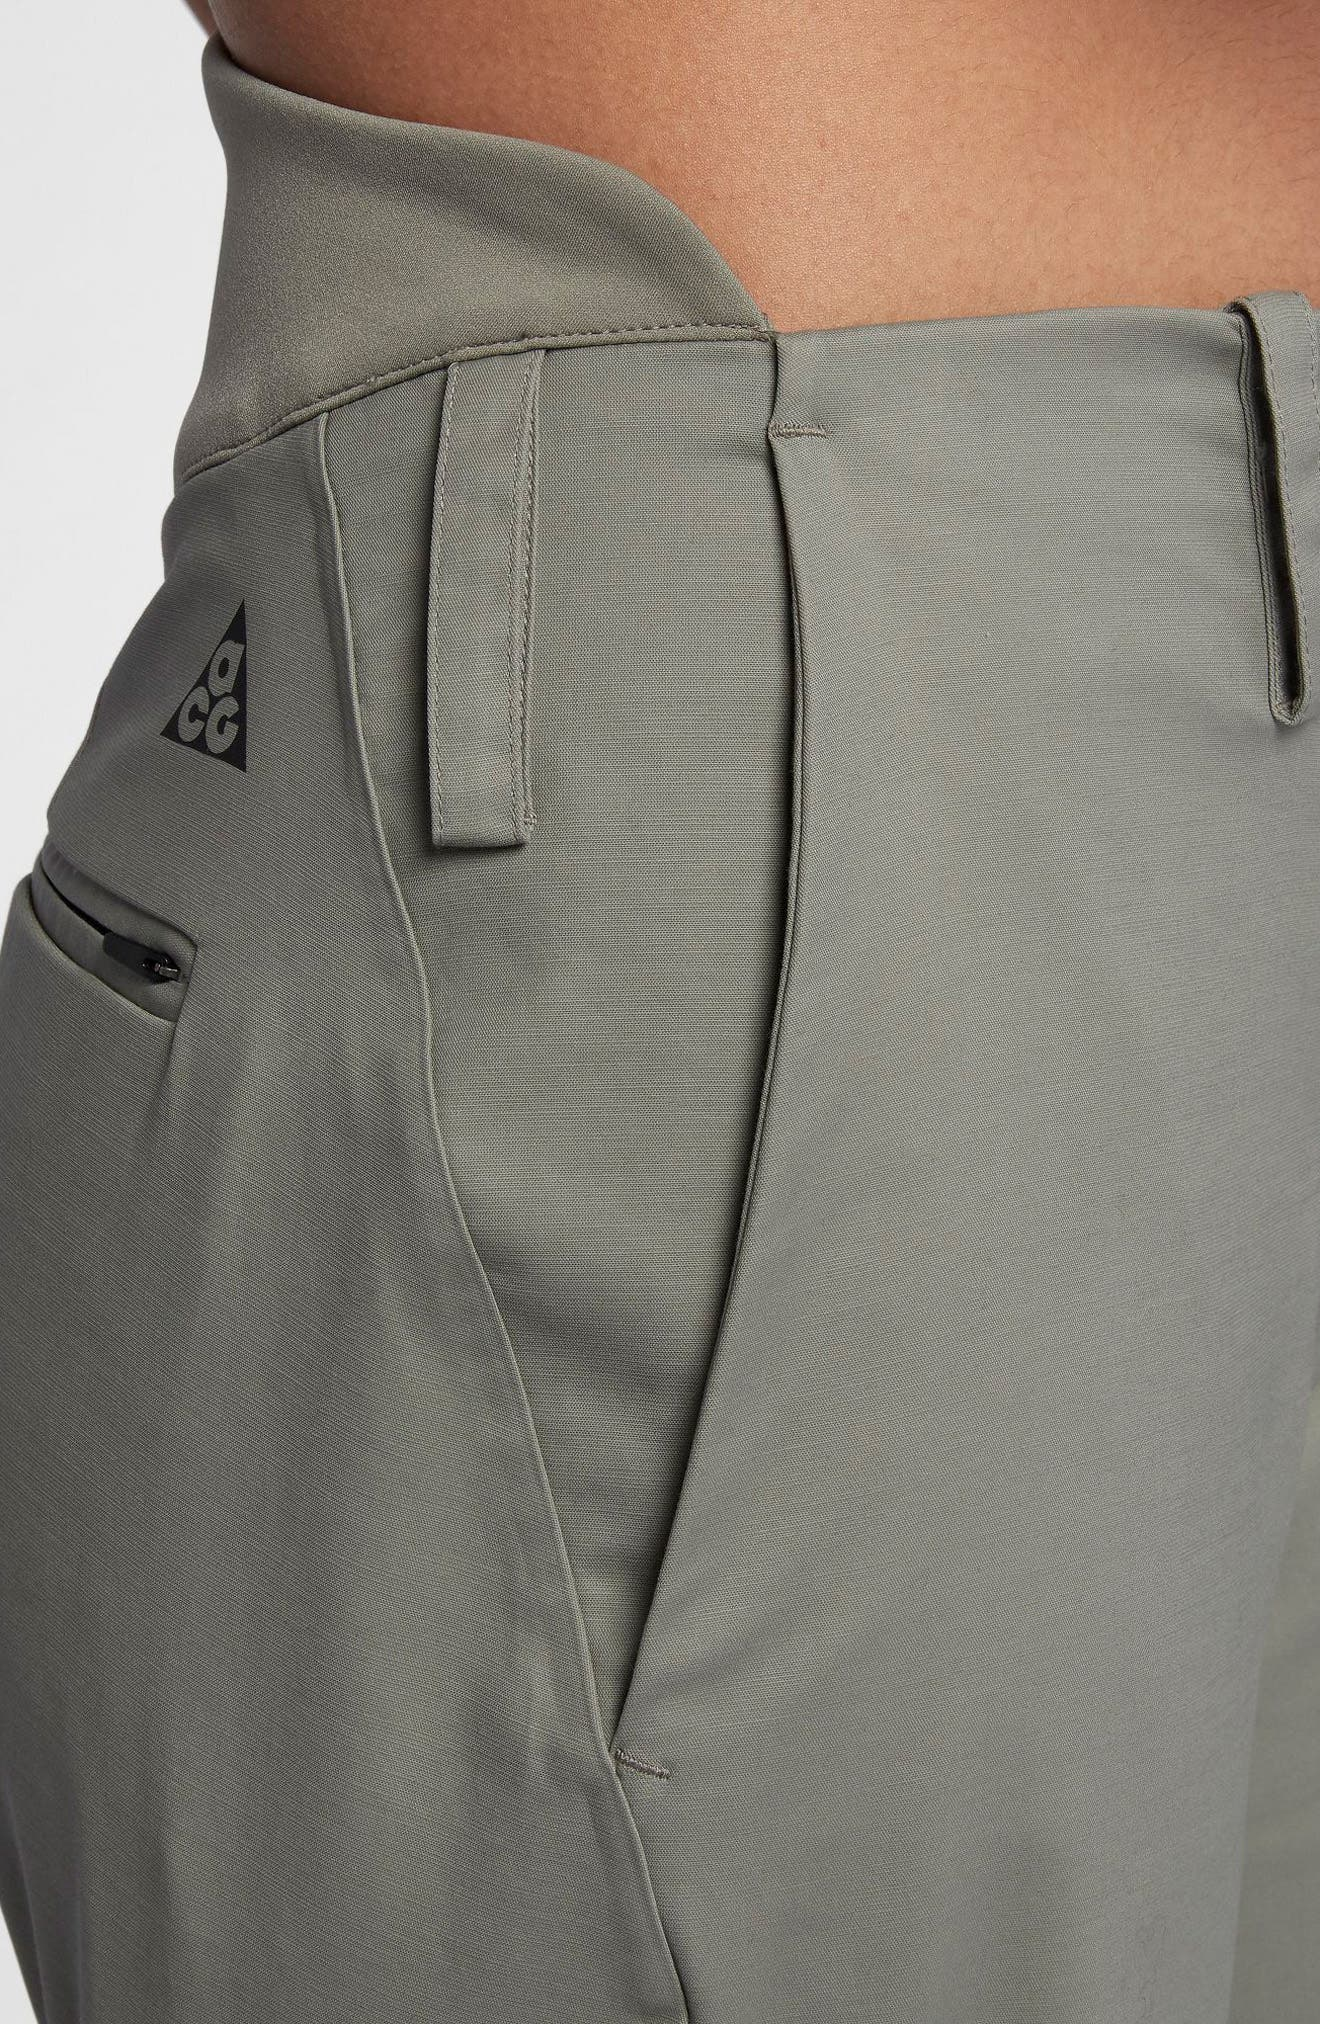 NikeLab ACG Tech Woven Pants,                             Alternate thumbnail 6, color,                             020